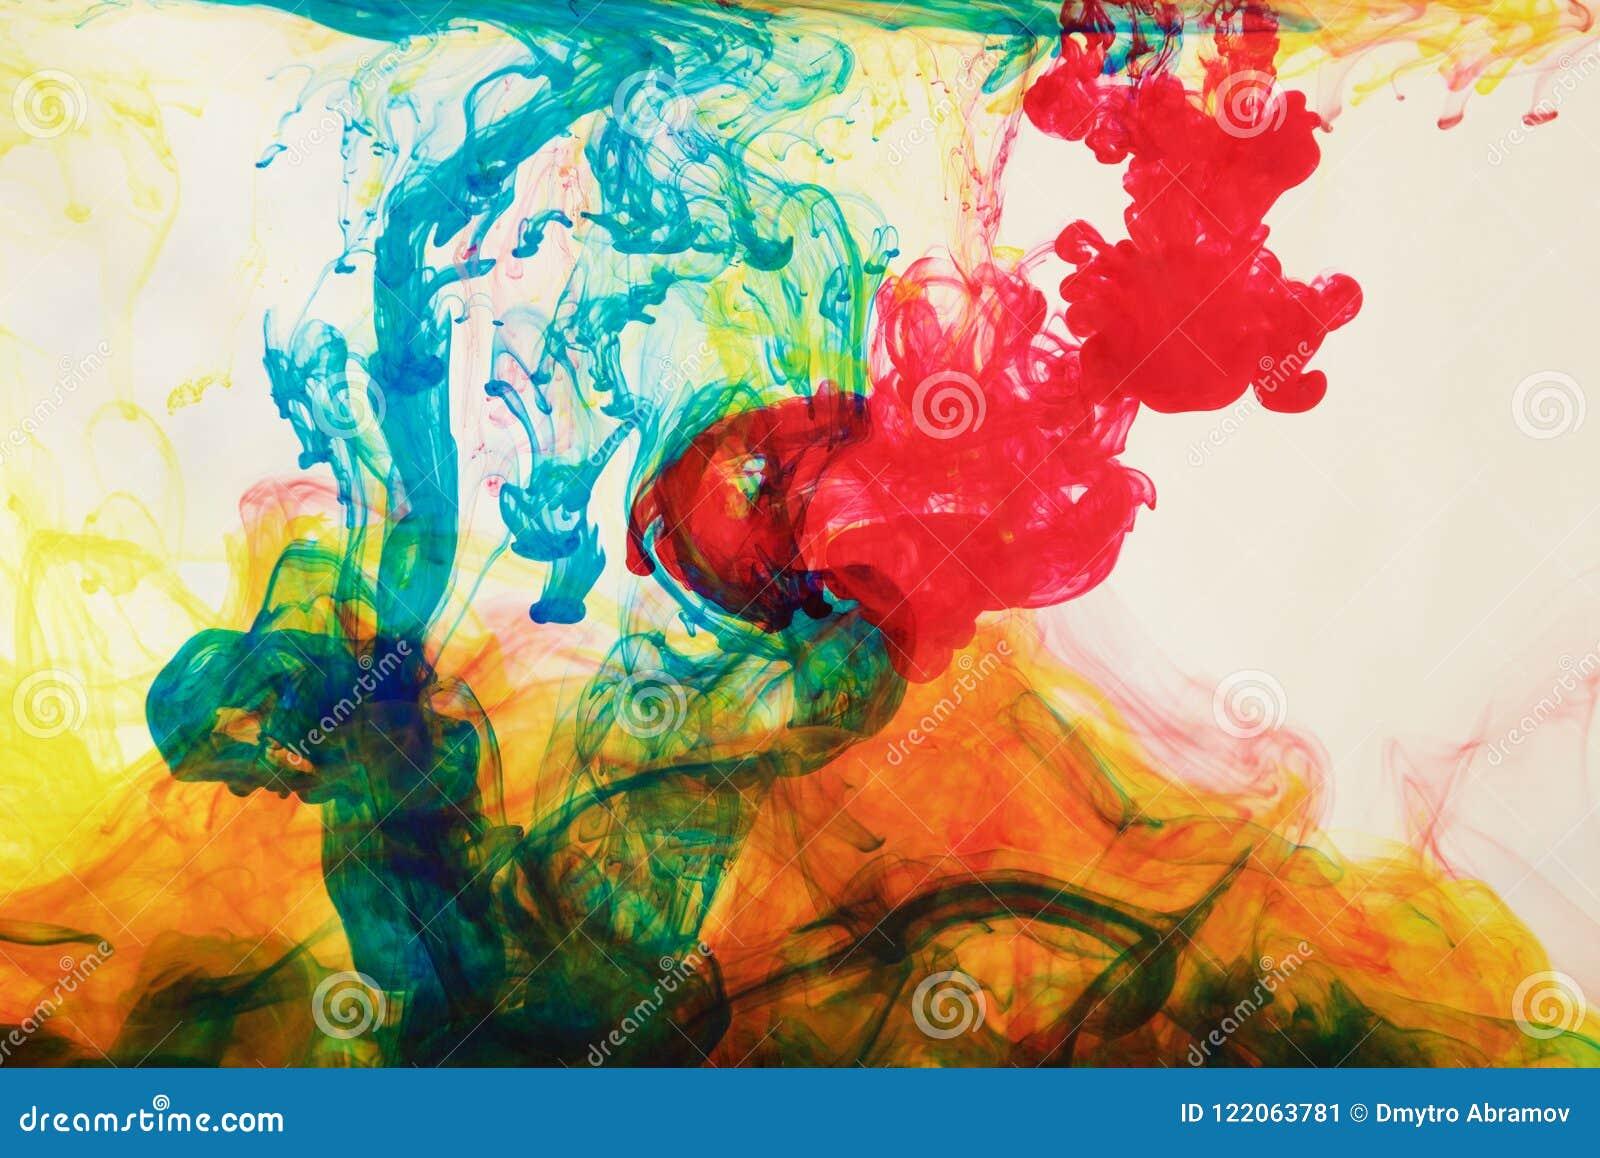 Tinten im Wasser, Farbabstraktion, Farbexplosion